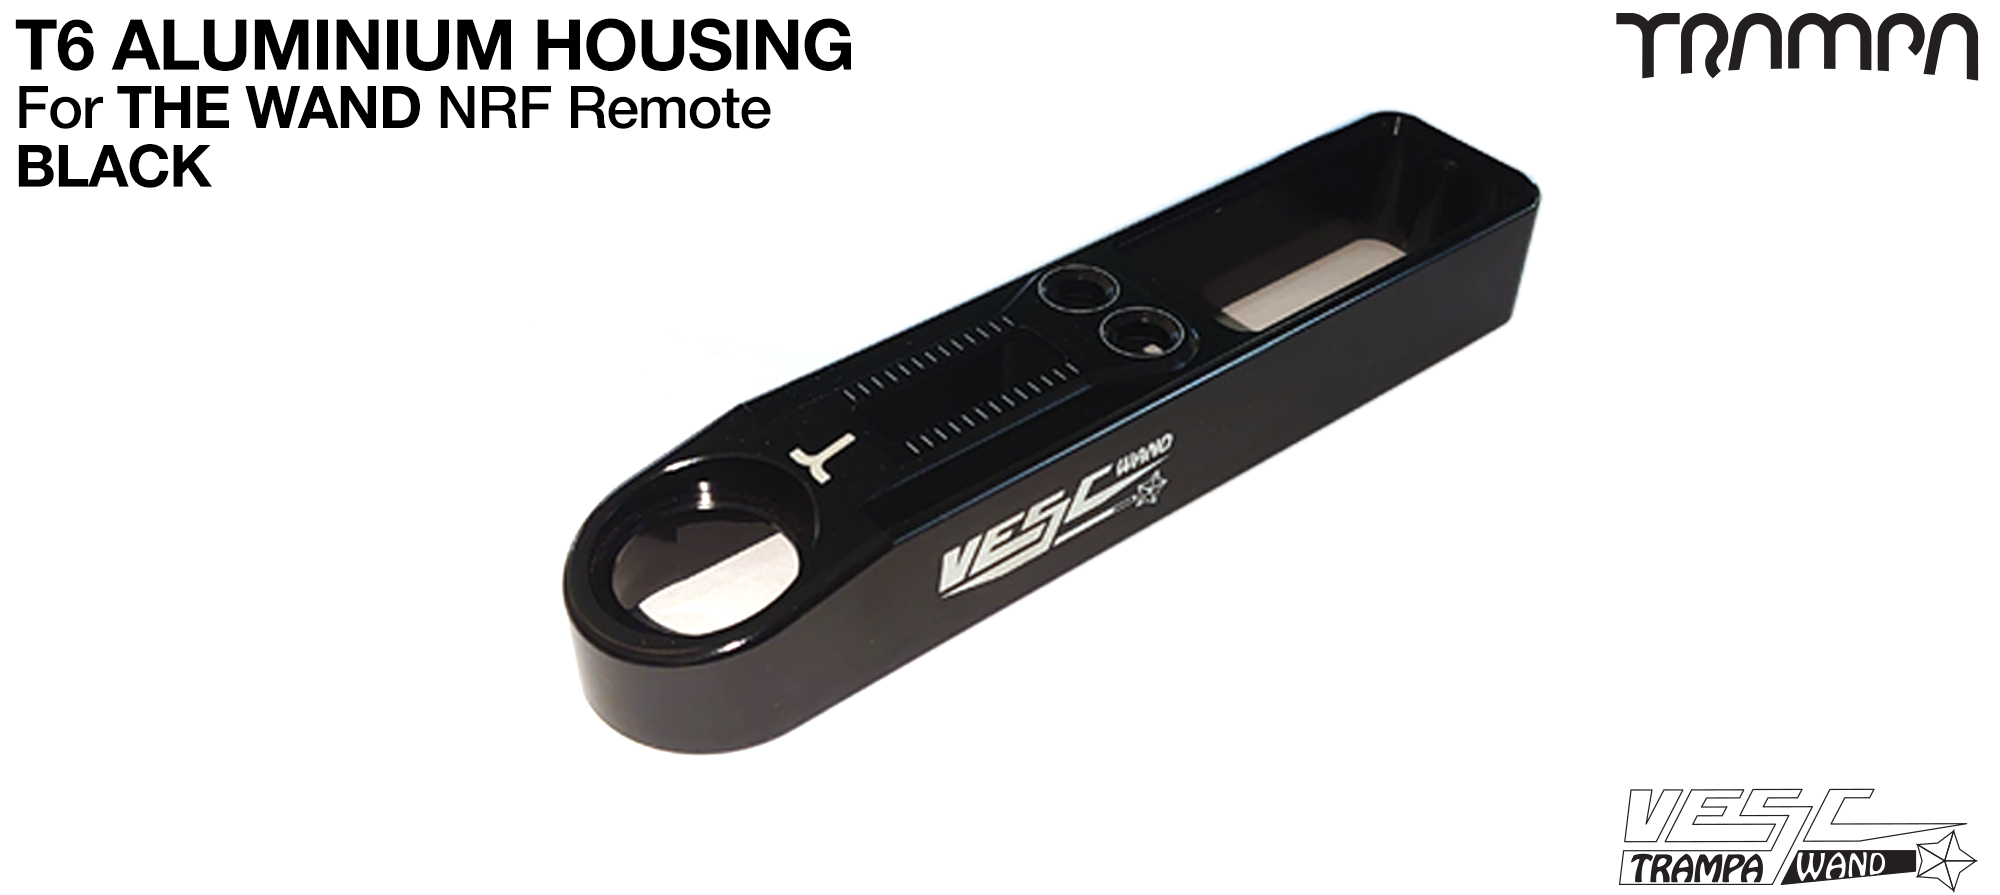 WAND T6 Aluminium Housing - BLACK Anodised